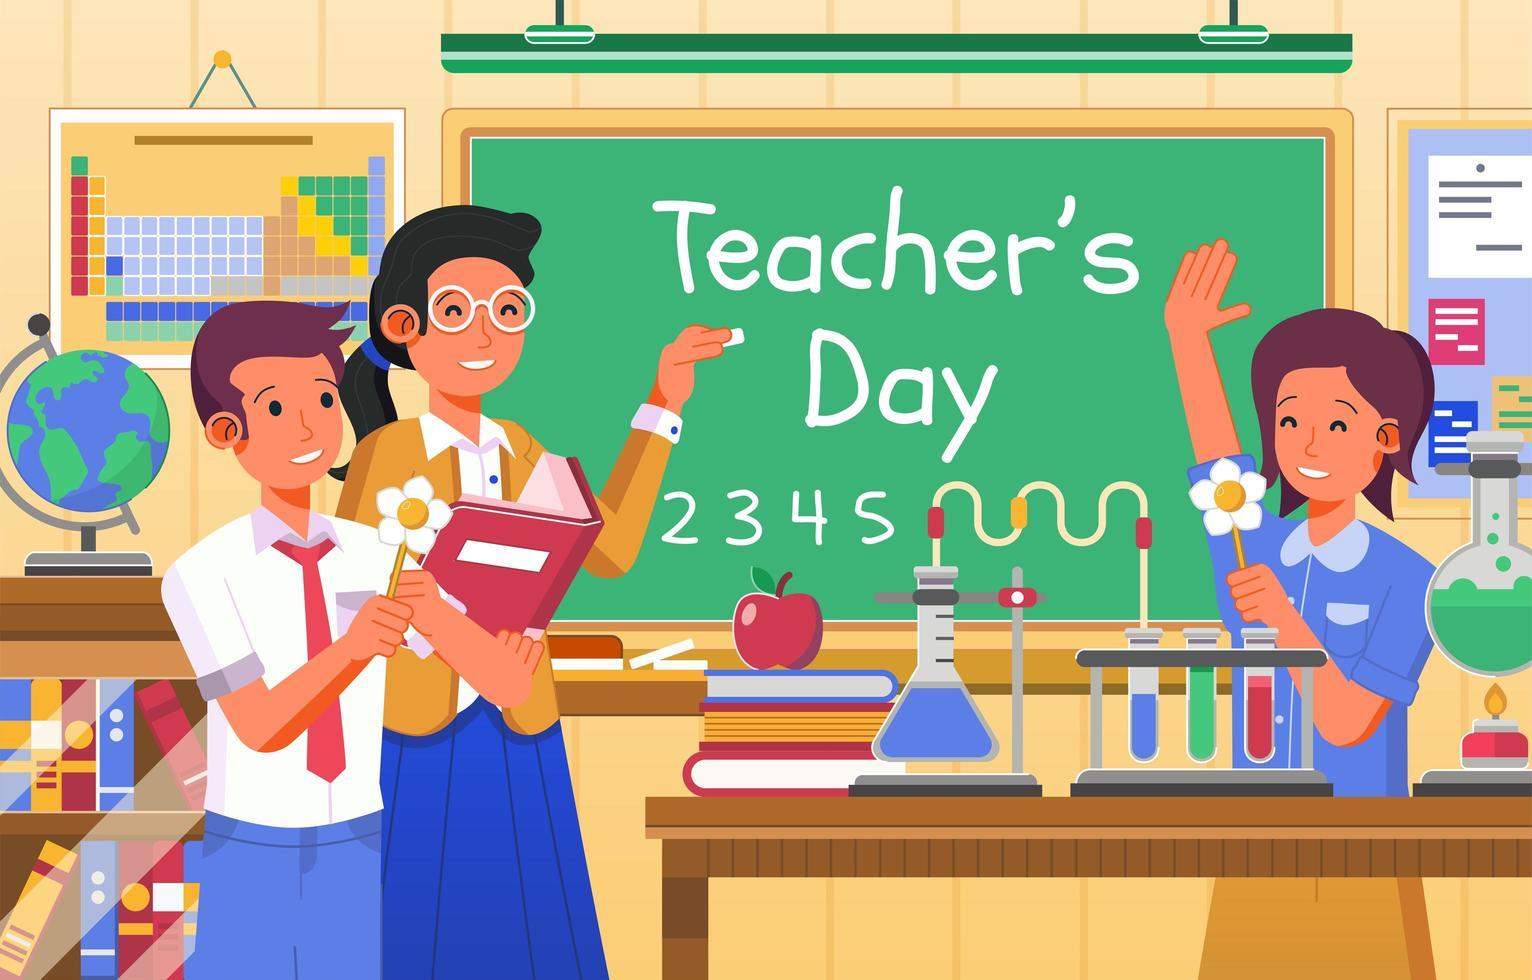 lärarens dag vid kemisk klassdesign vektor